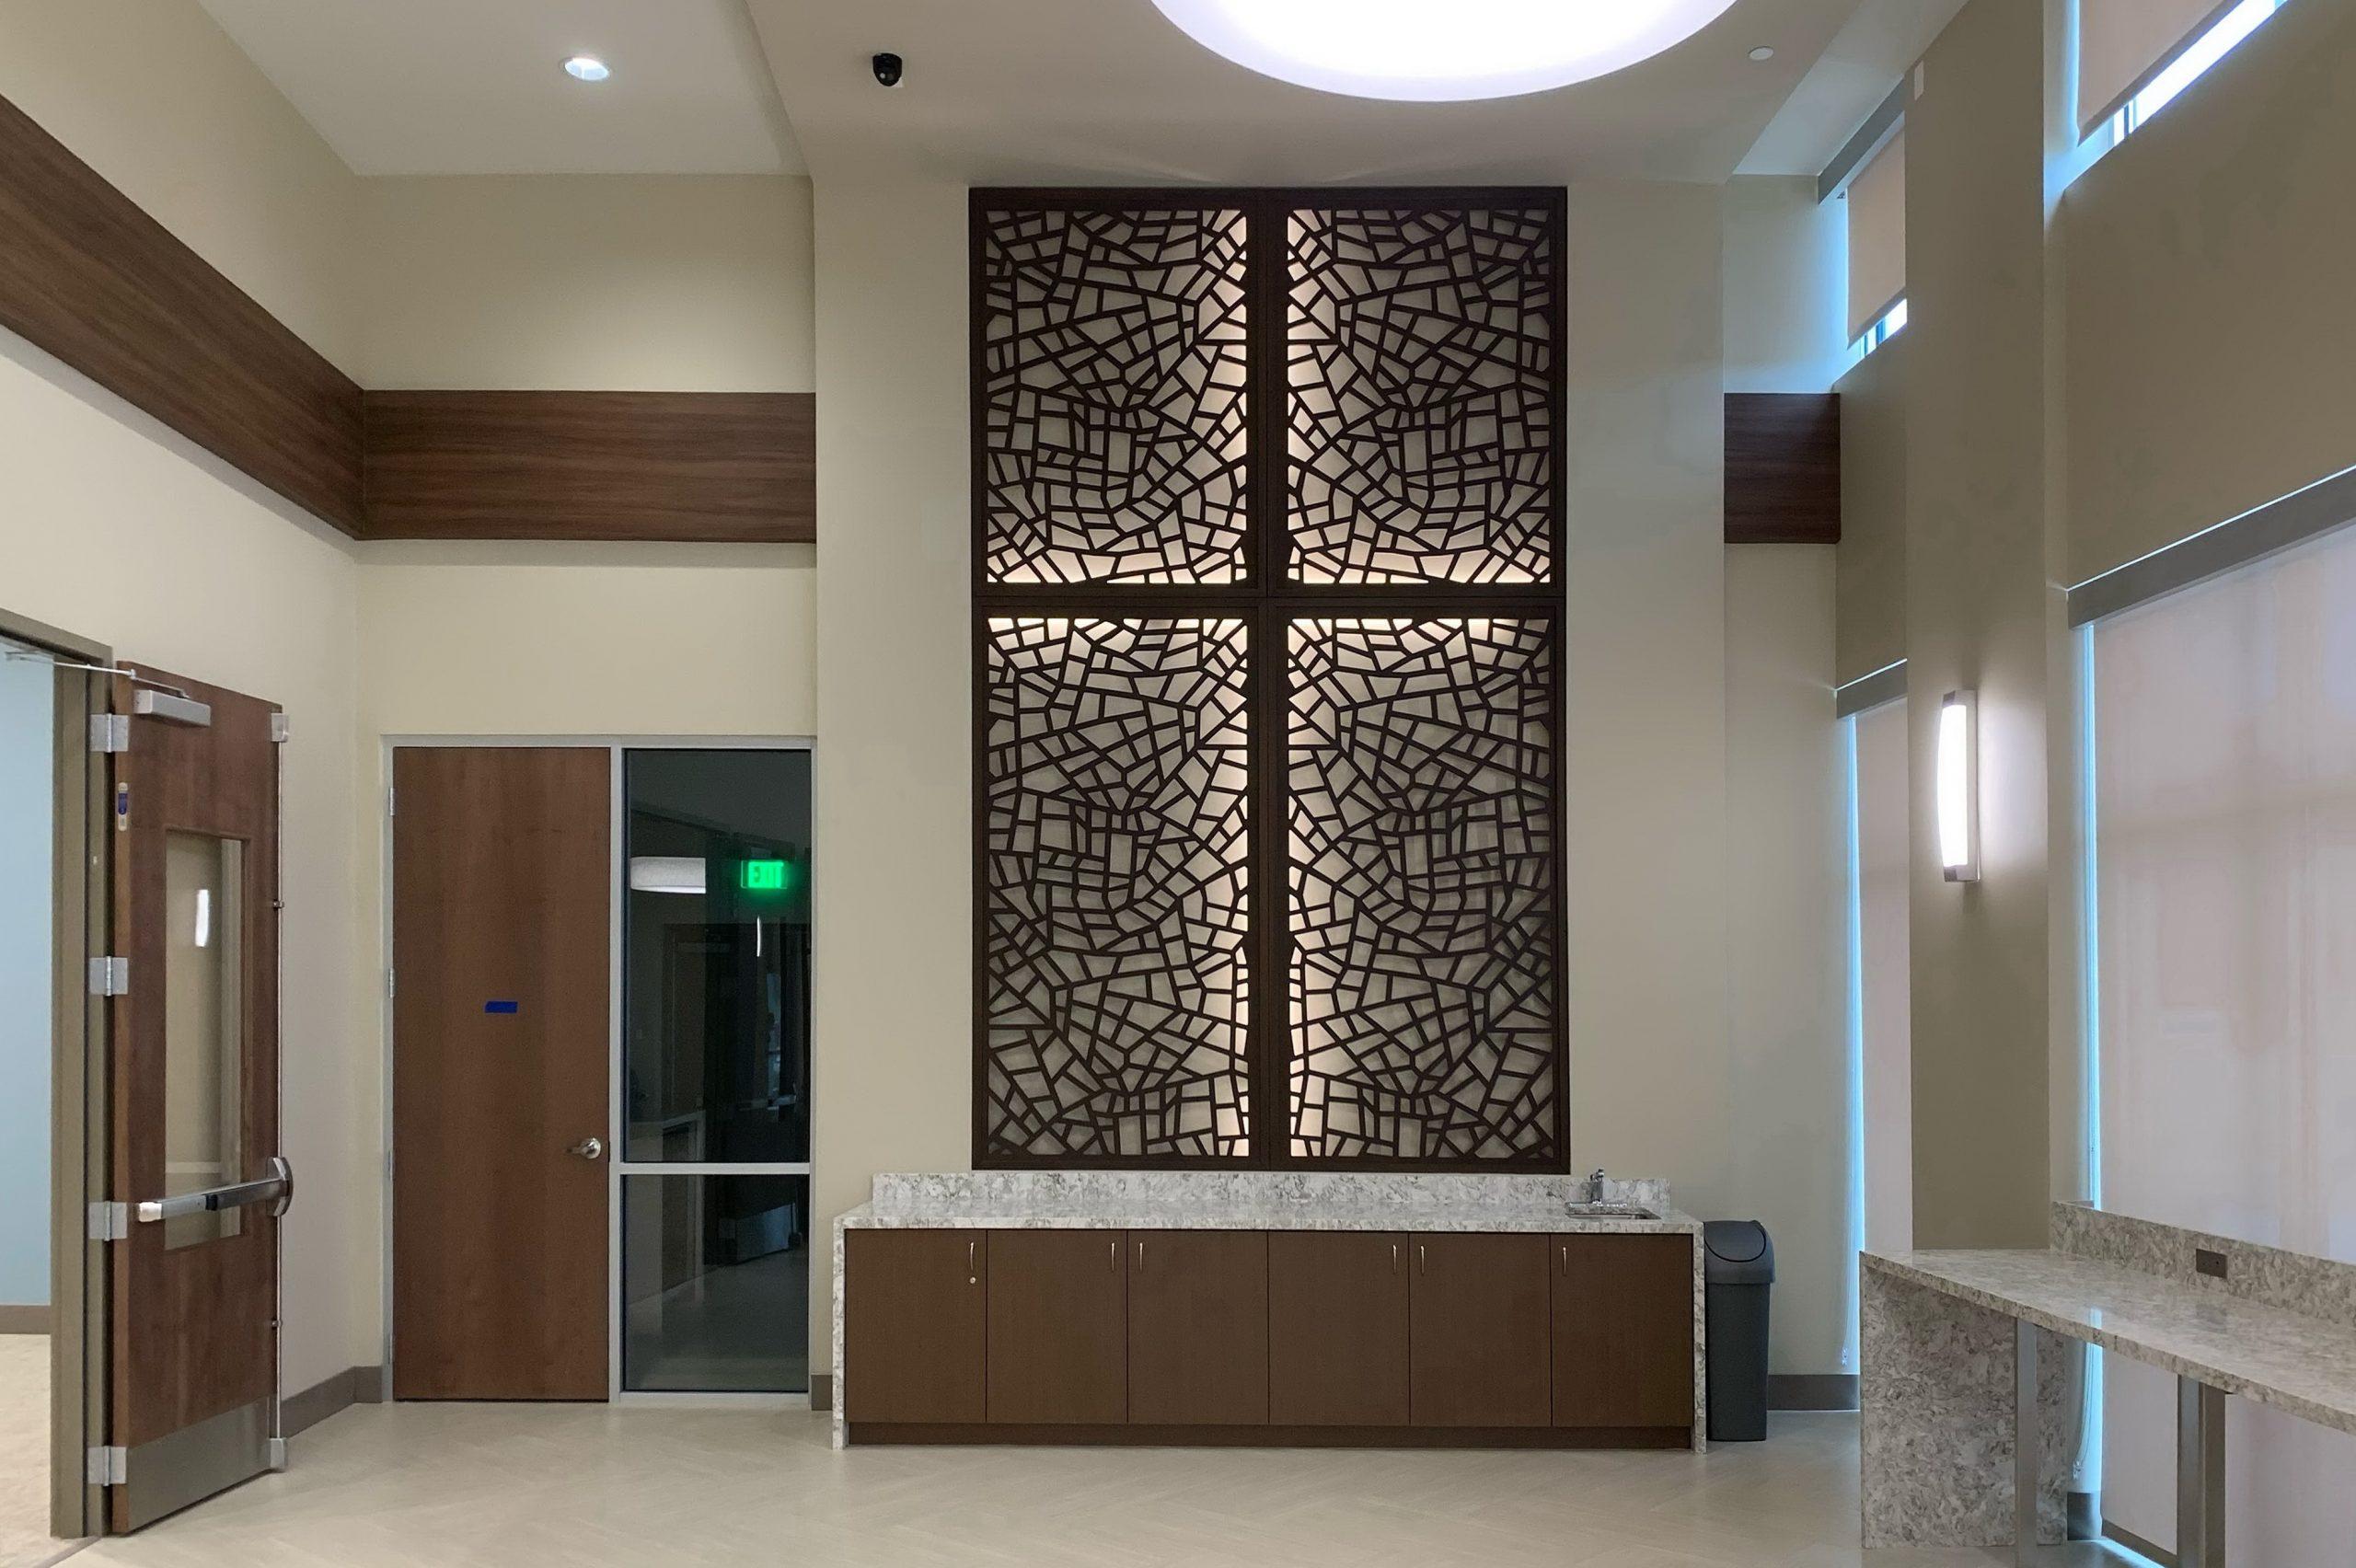 Tableaux Decorative Grilles with backlighting at St. Vincent de Paul Family Life Center